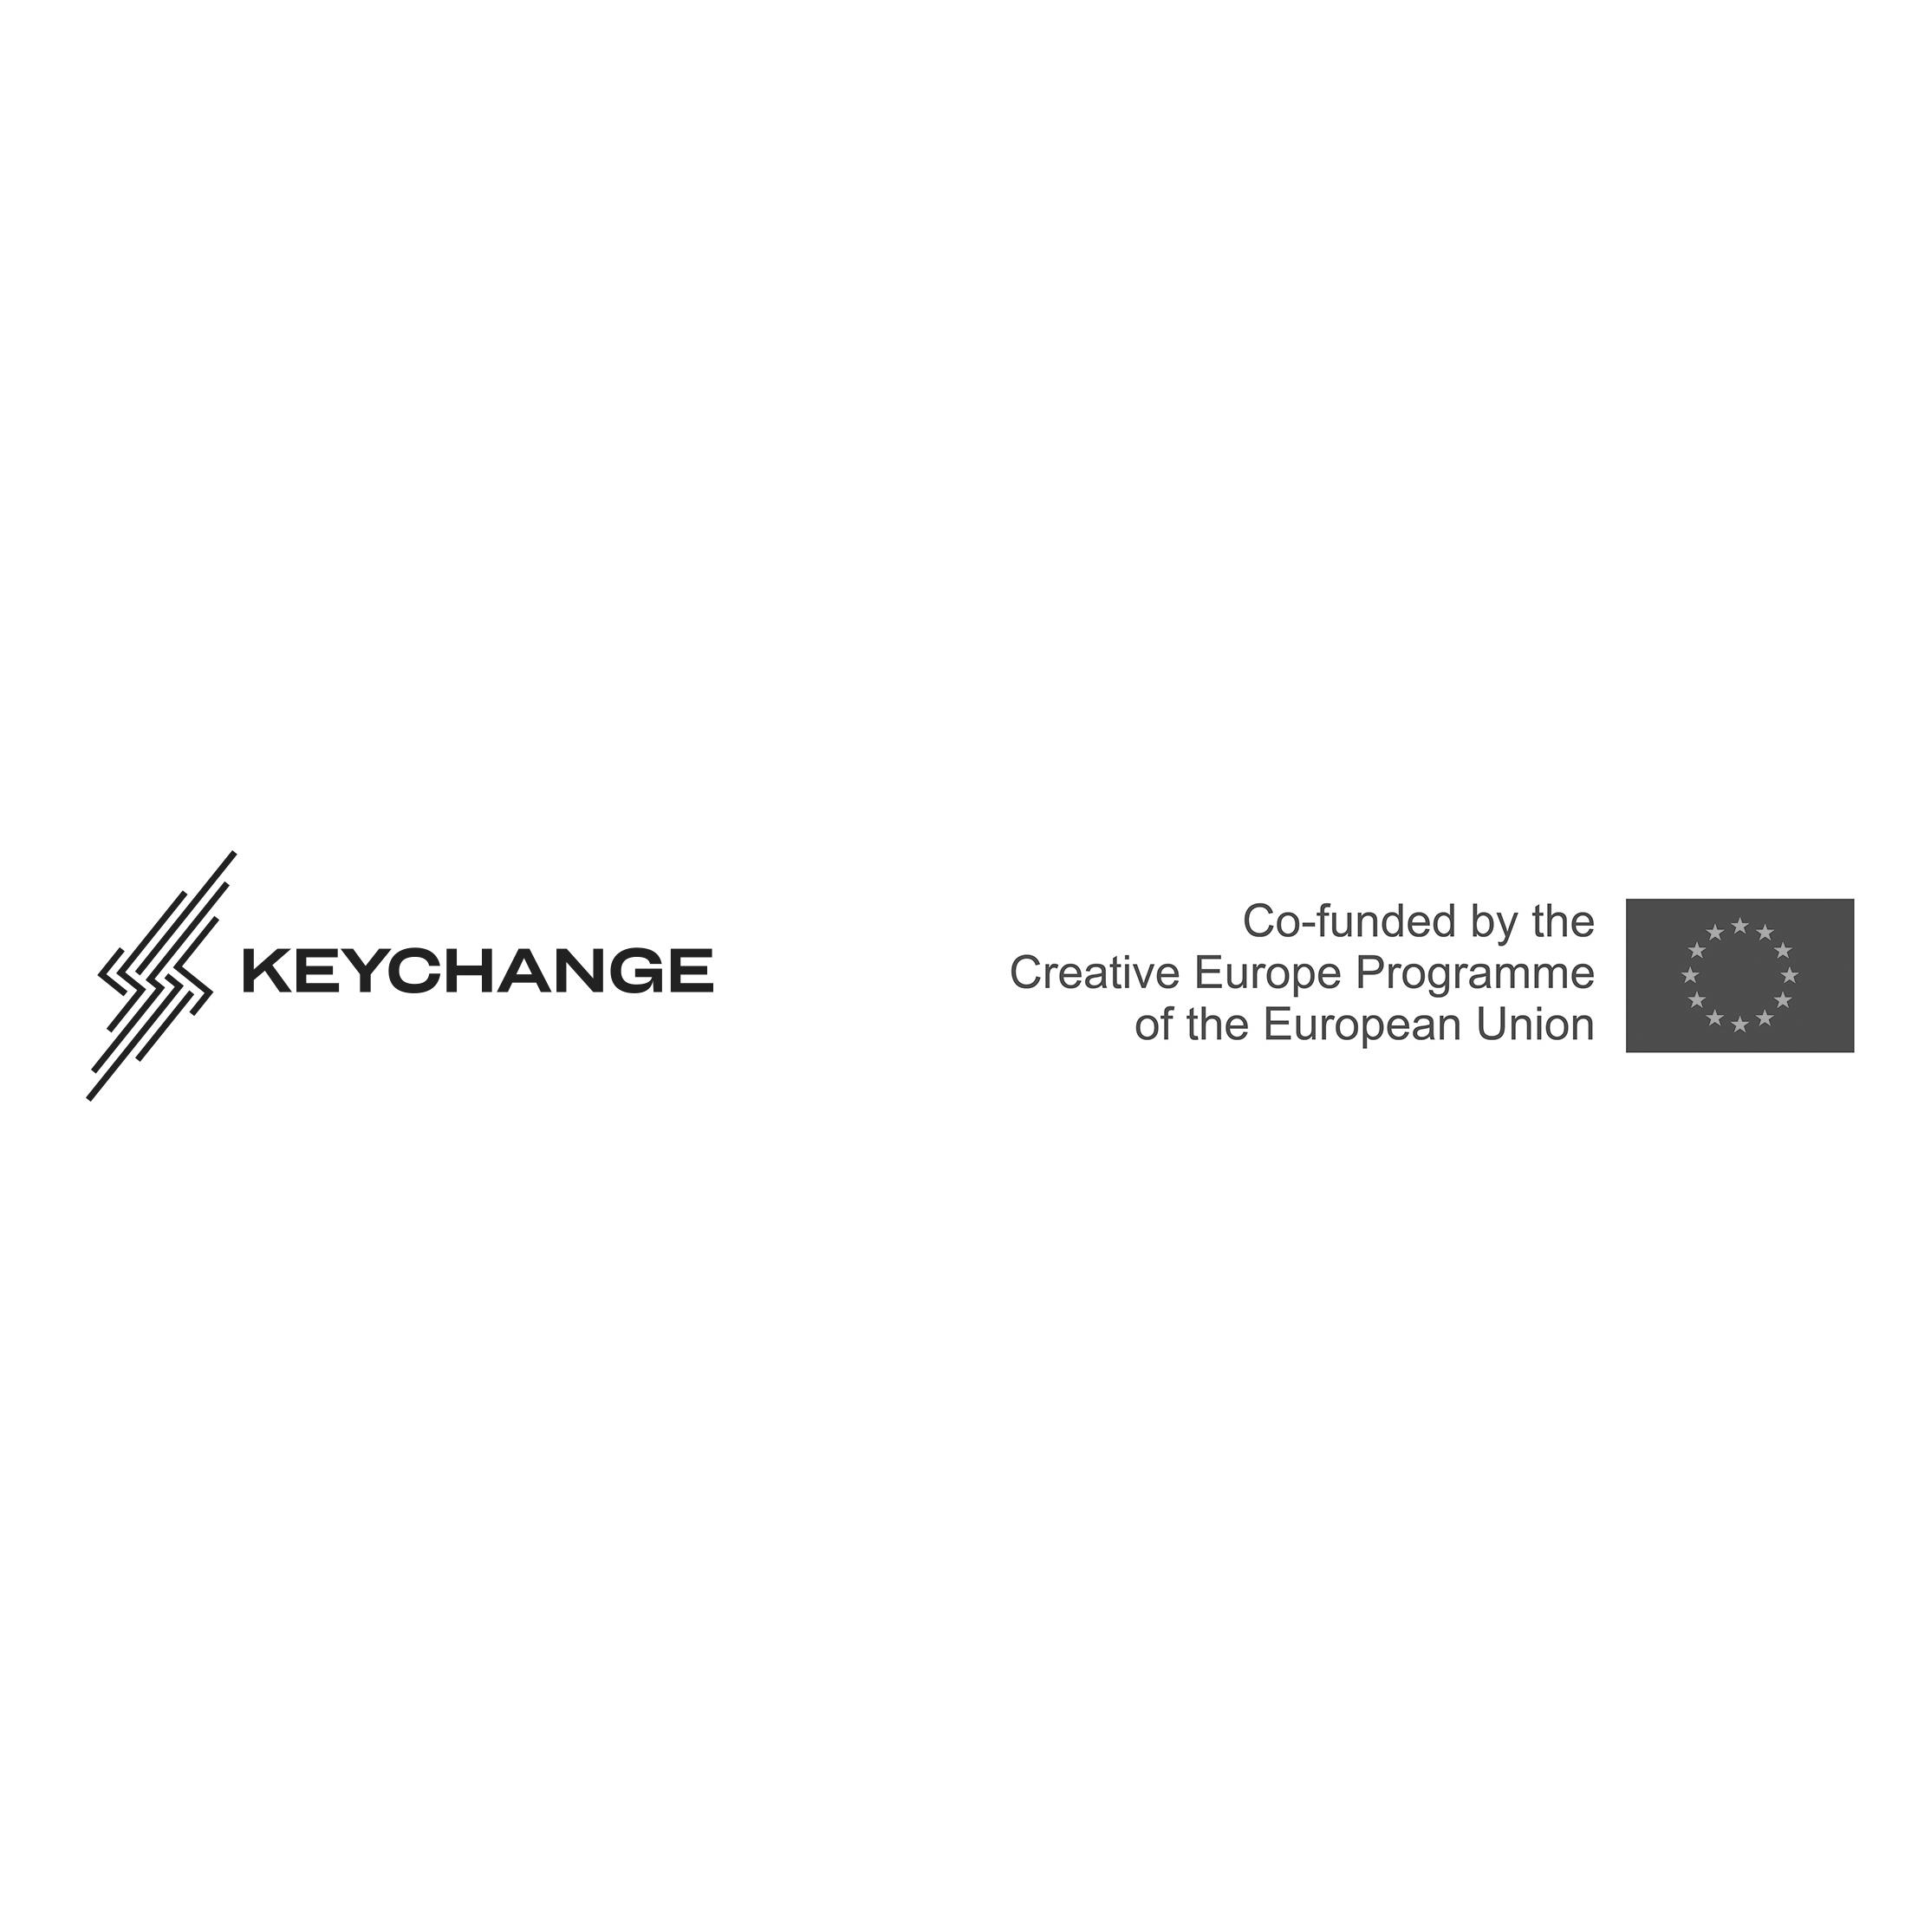 Keychange and CE logo dark